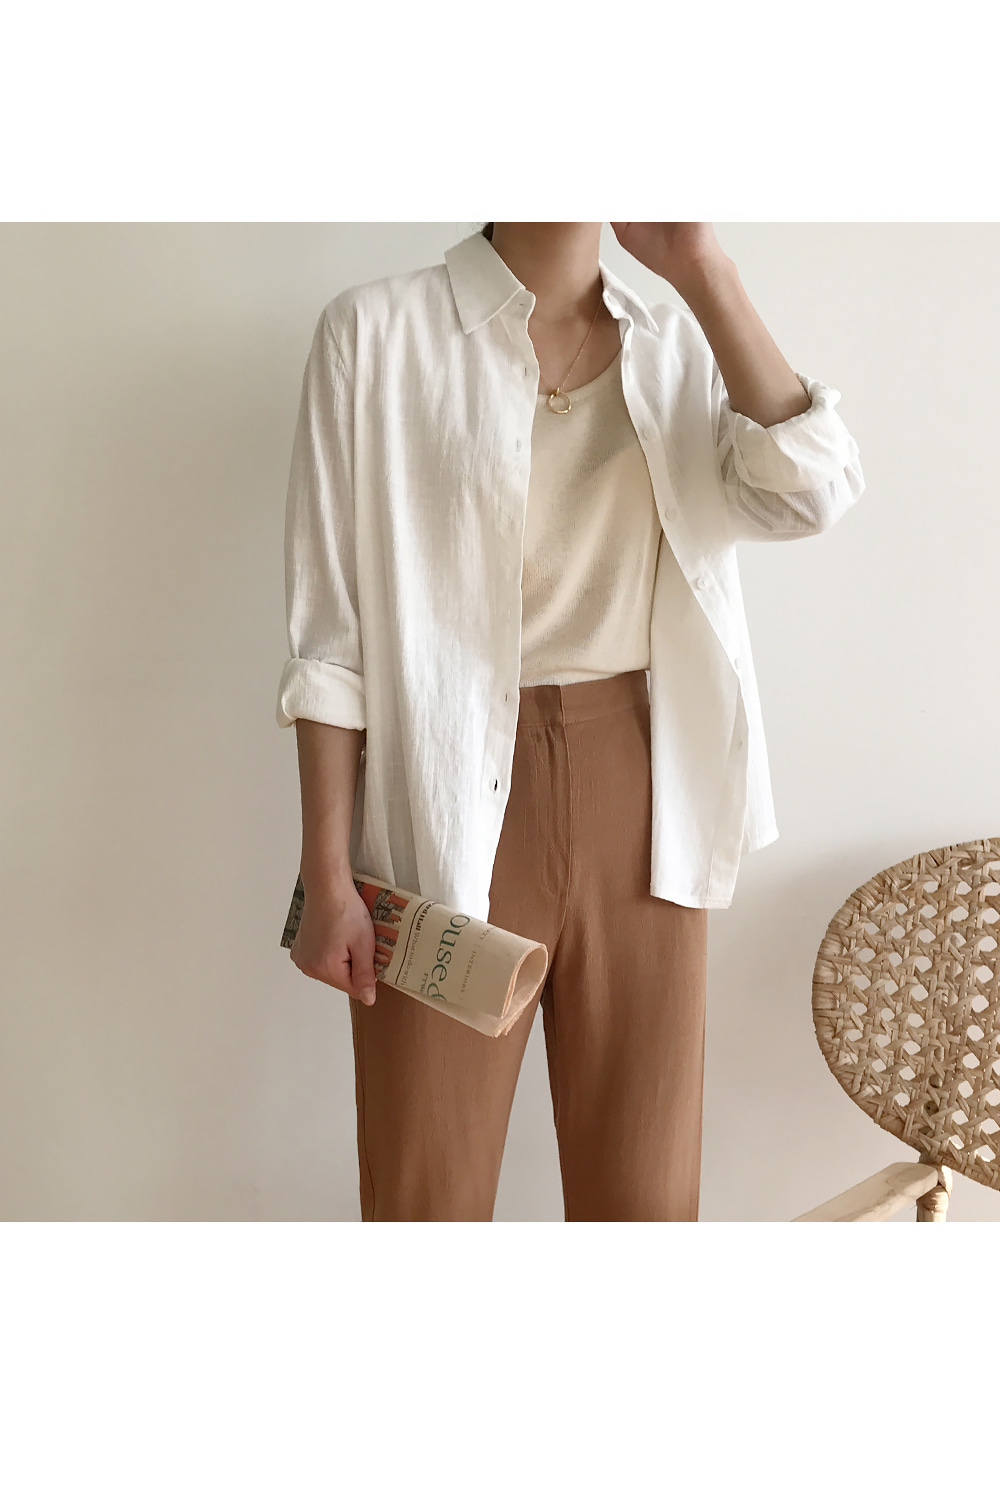 Solid Classic Linen Shirt-holiholic.com